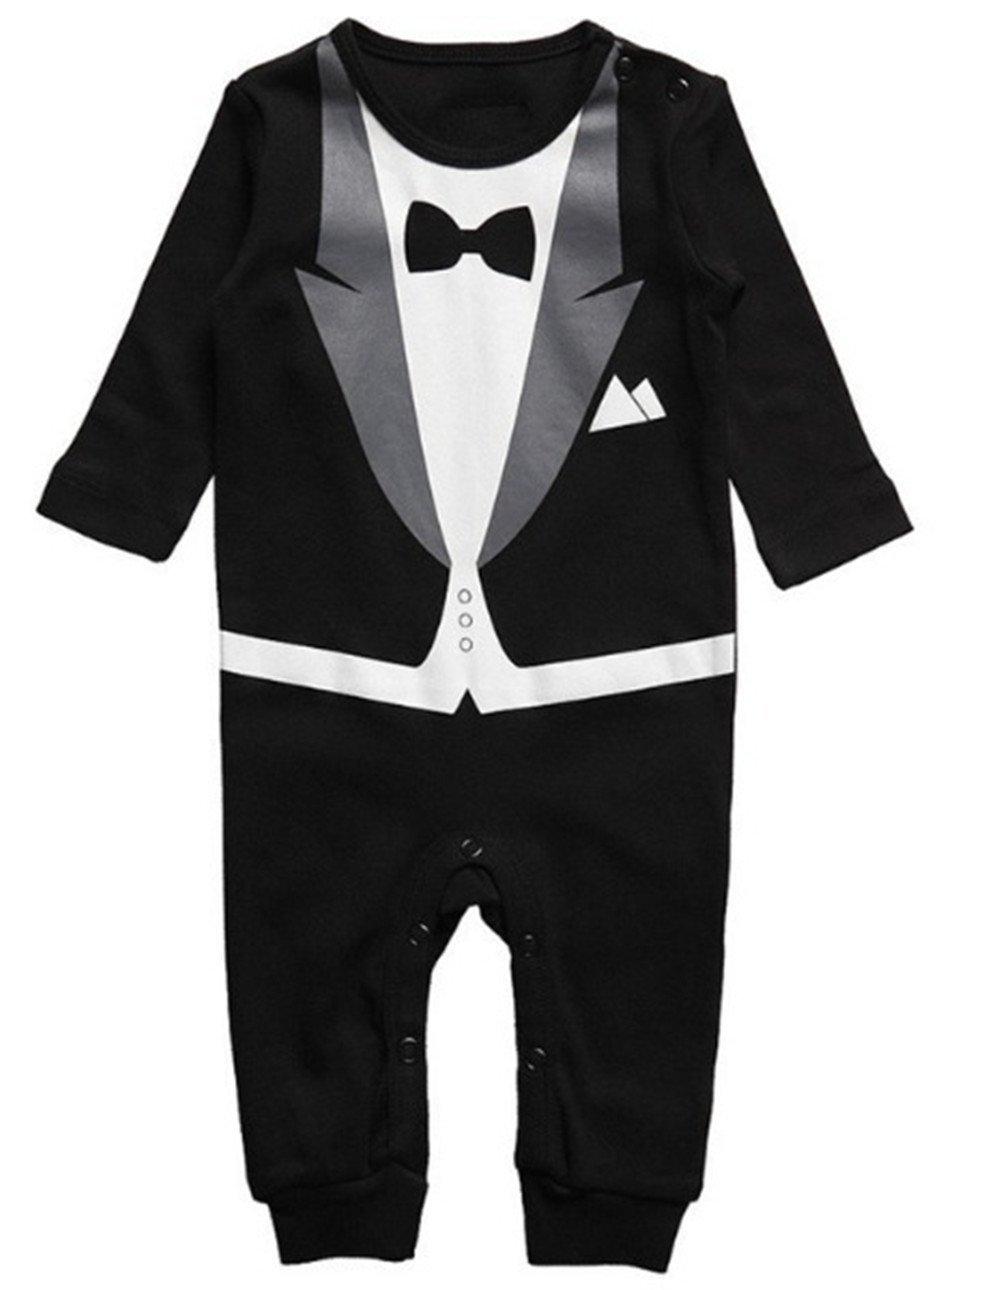 LJYH Baby Boy Romper Tuxedo Jumpsuit Gentleman One-Piece Romper Bowtie Bodysuit